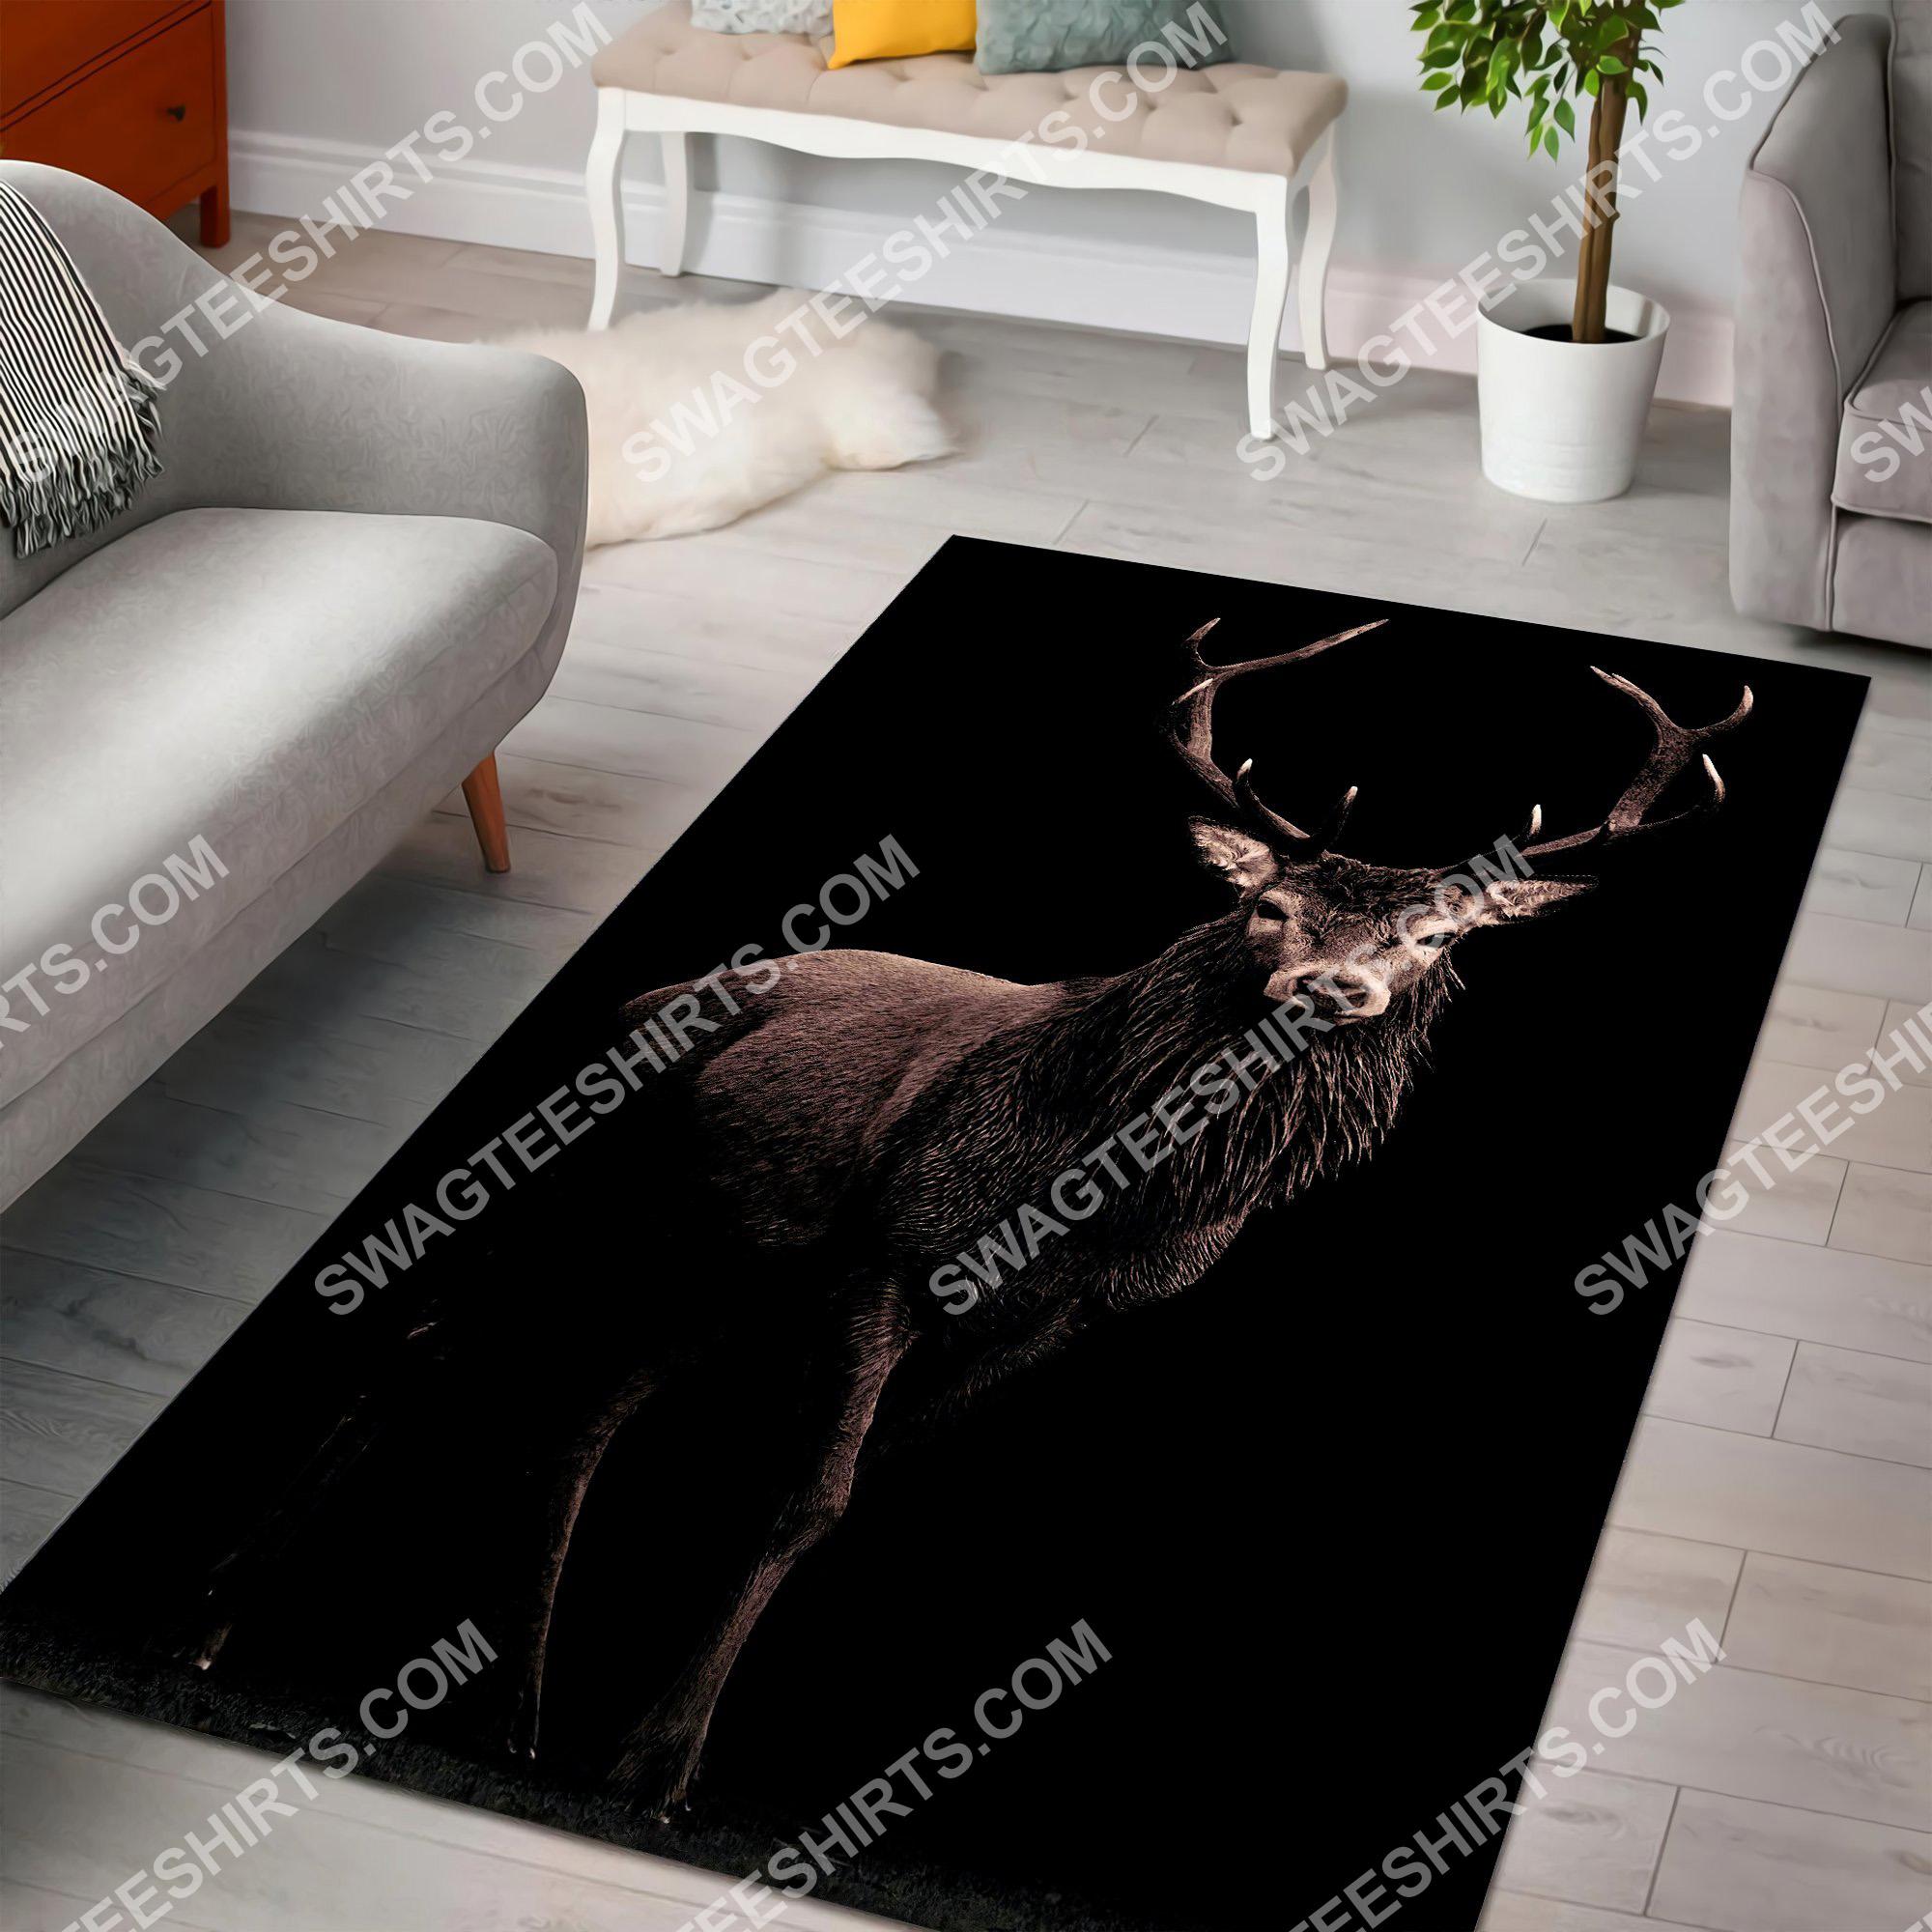 beautiful deer hunting season all over printed rug 2(1)